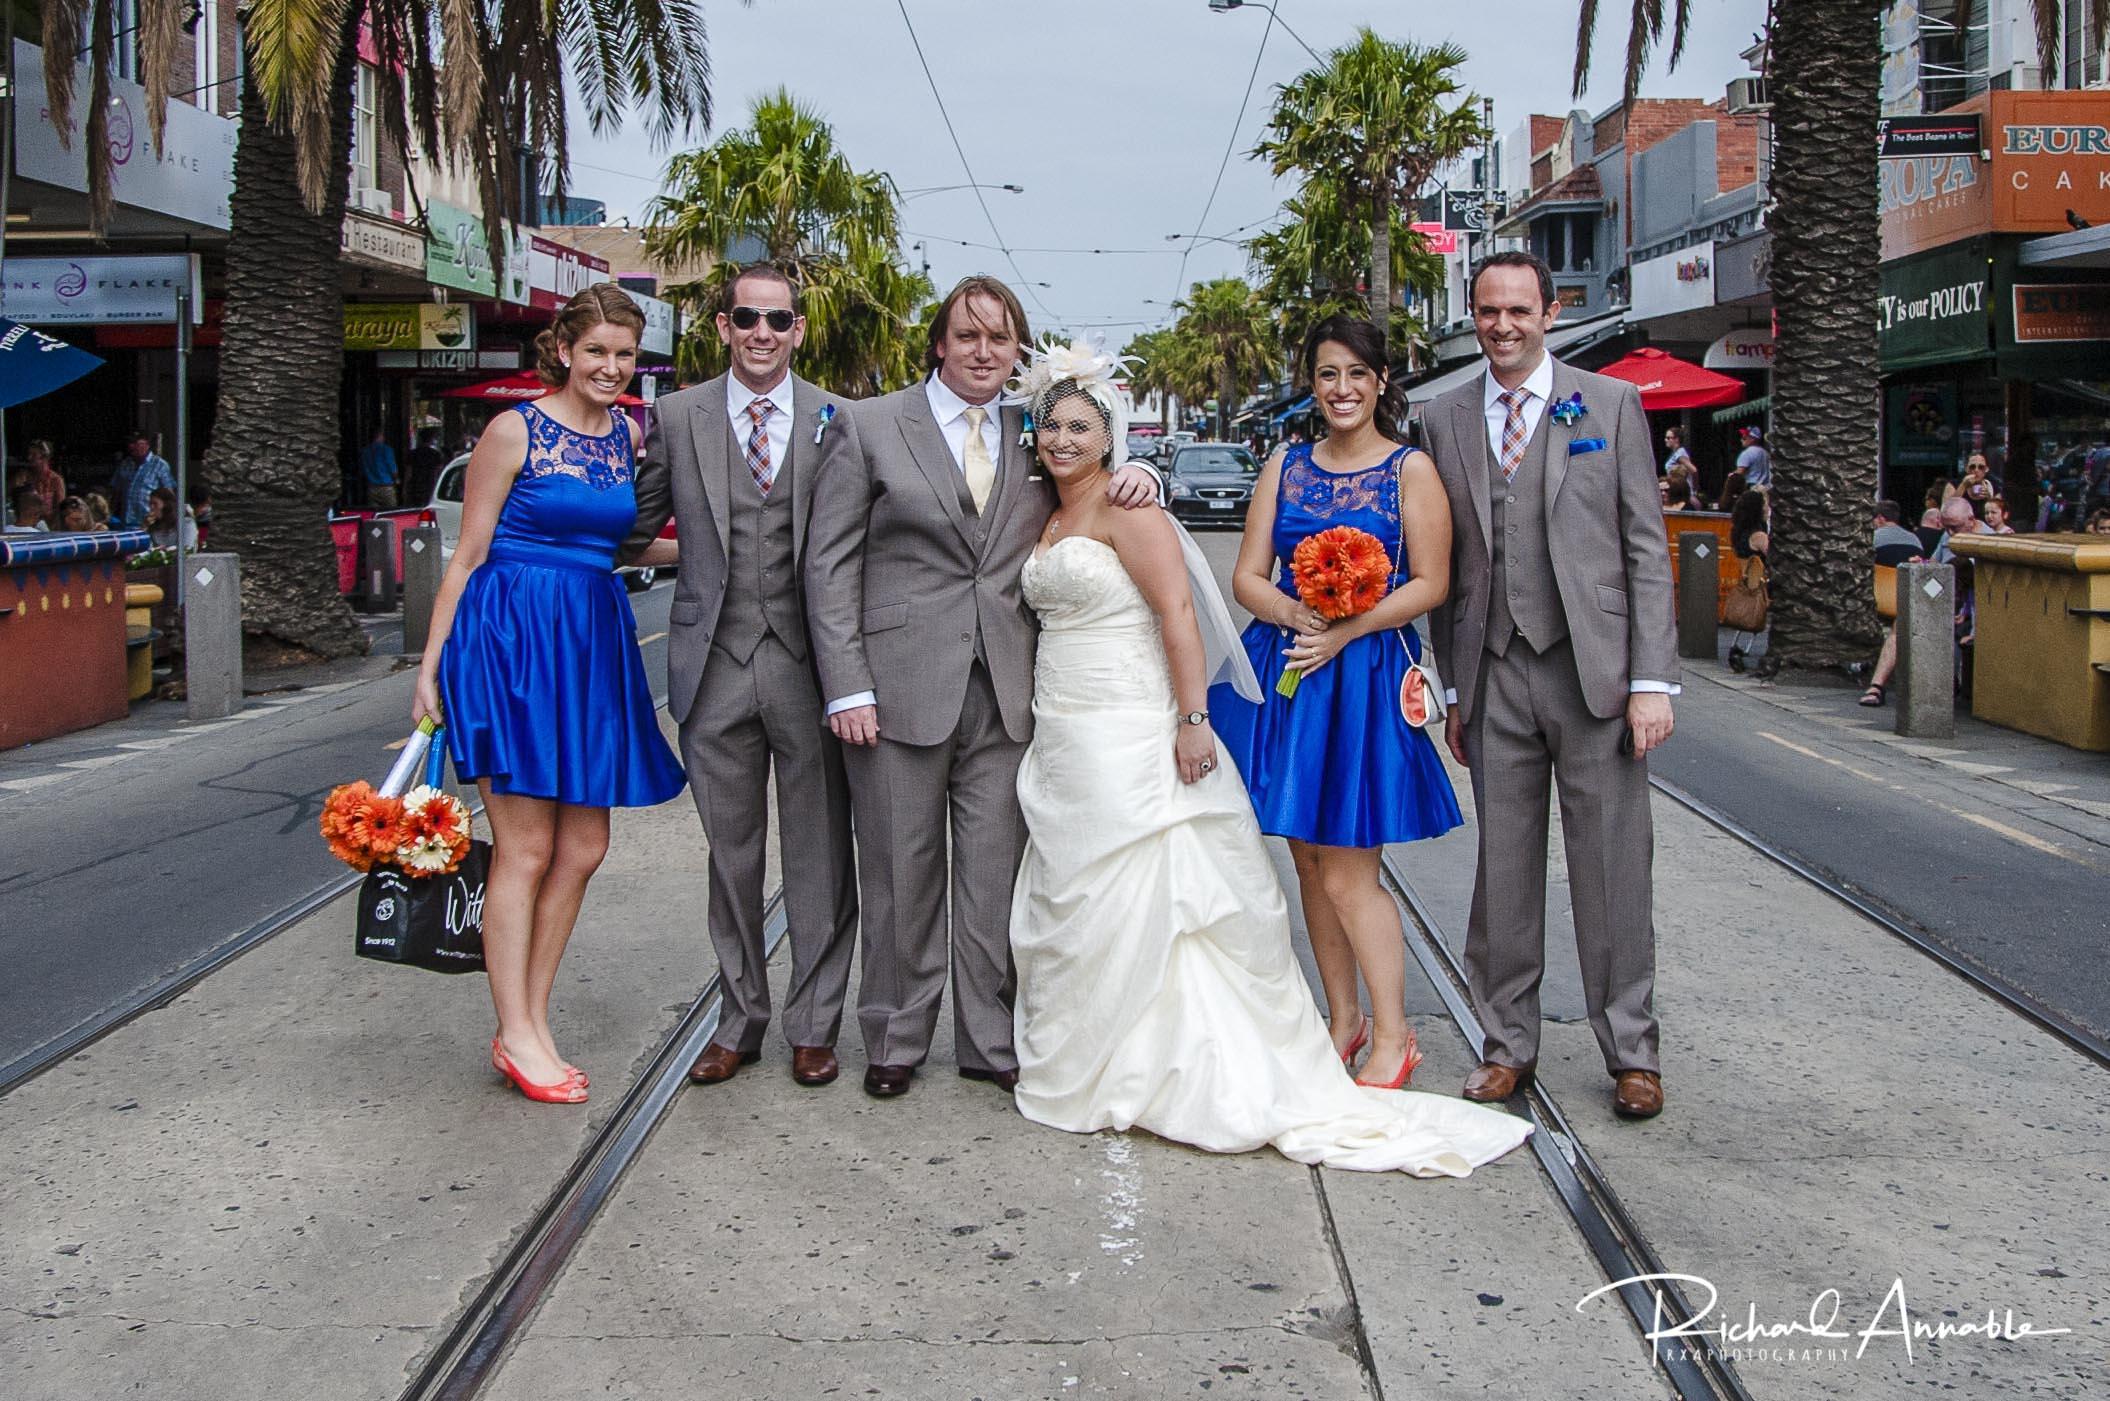 Laura & Bryan - Click here to view photographs from Laura & Bryan's St. Kilda wedding.